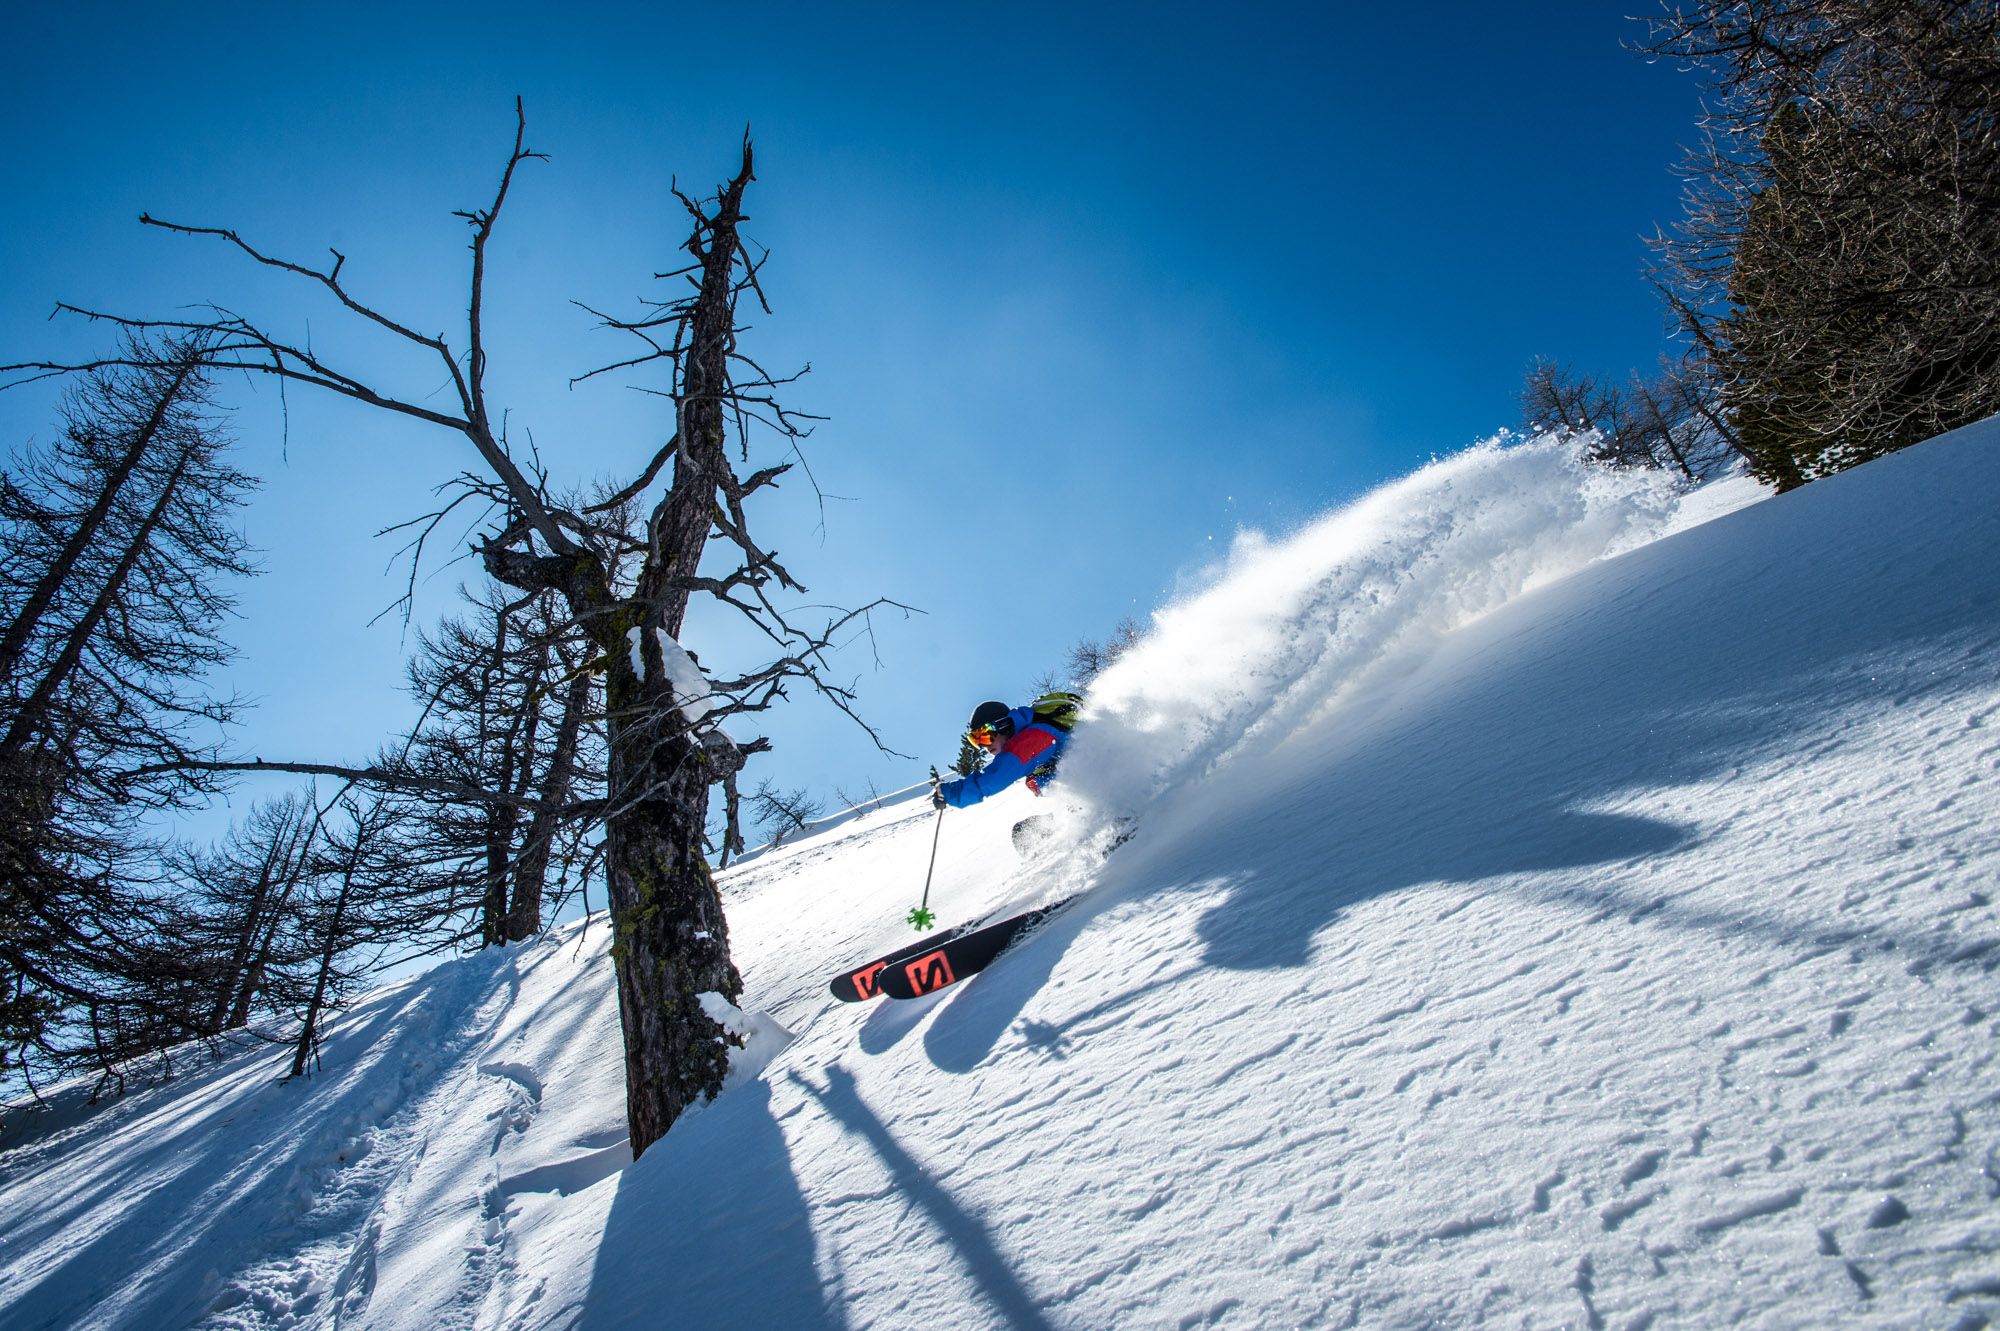 montagne-neige-ski-snowboard-salomon